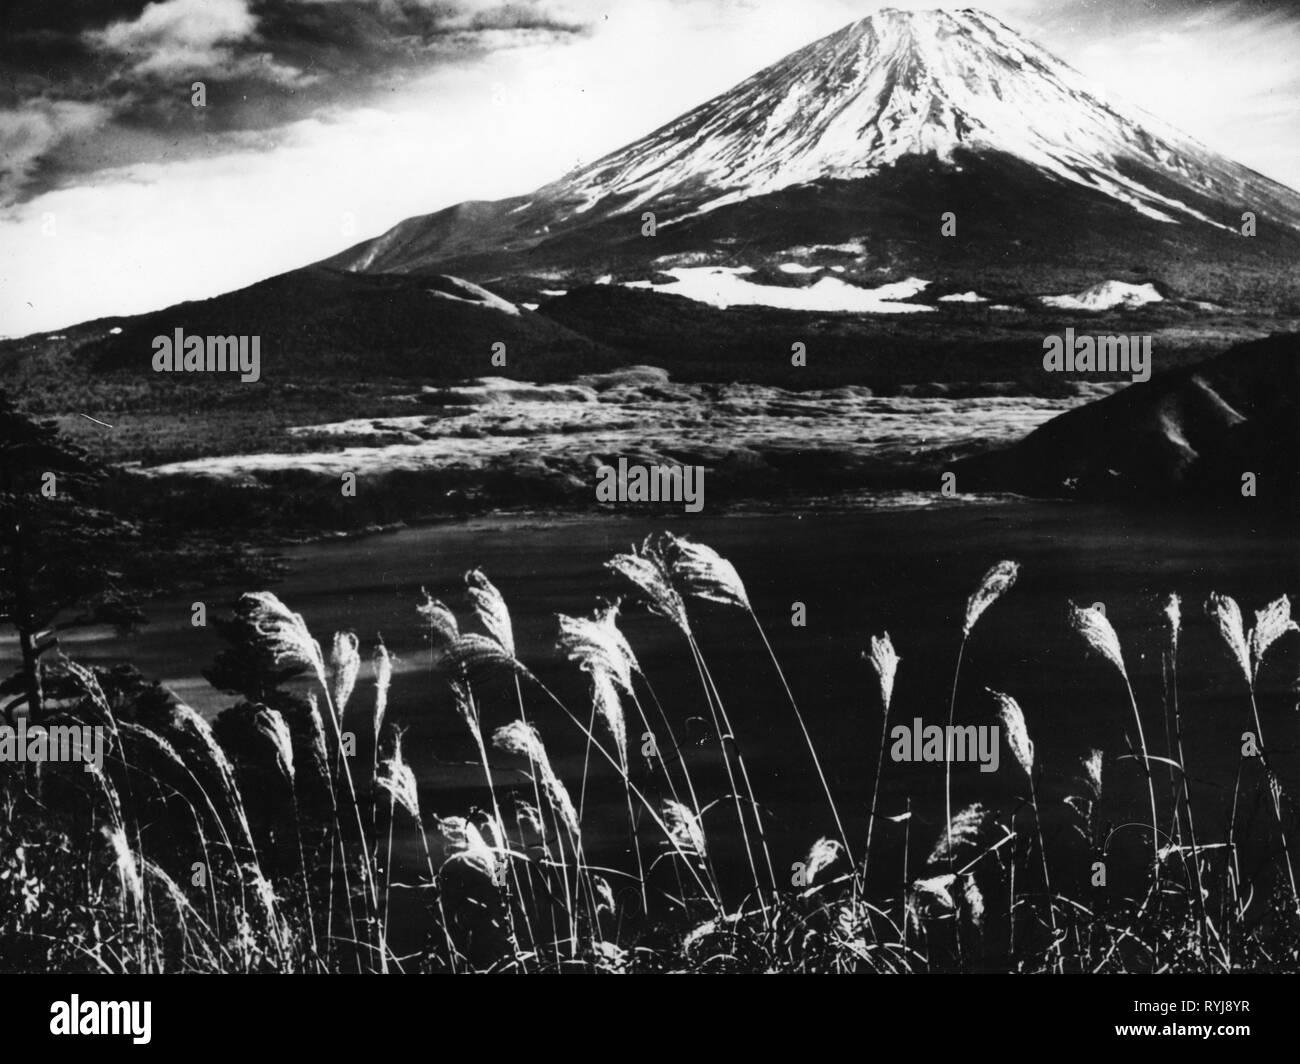 Geographie/Reisen, Japan, Landschaften, Berge, Berg Fuji-san, historisch, historische, Asien, 20. Jahrhundert, Fujyama, Fujisan, Berg, Vulcano, Landschaft, Additional-Rights - Clearance-Info - Not-Available Stockbild